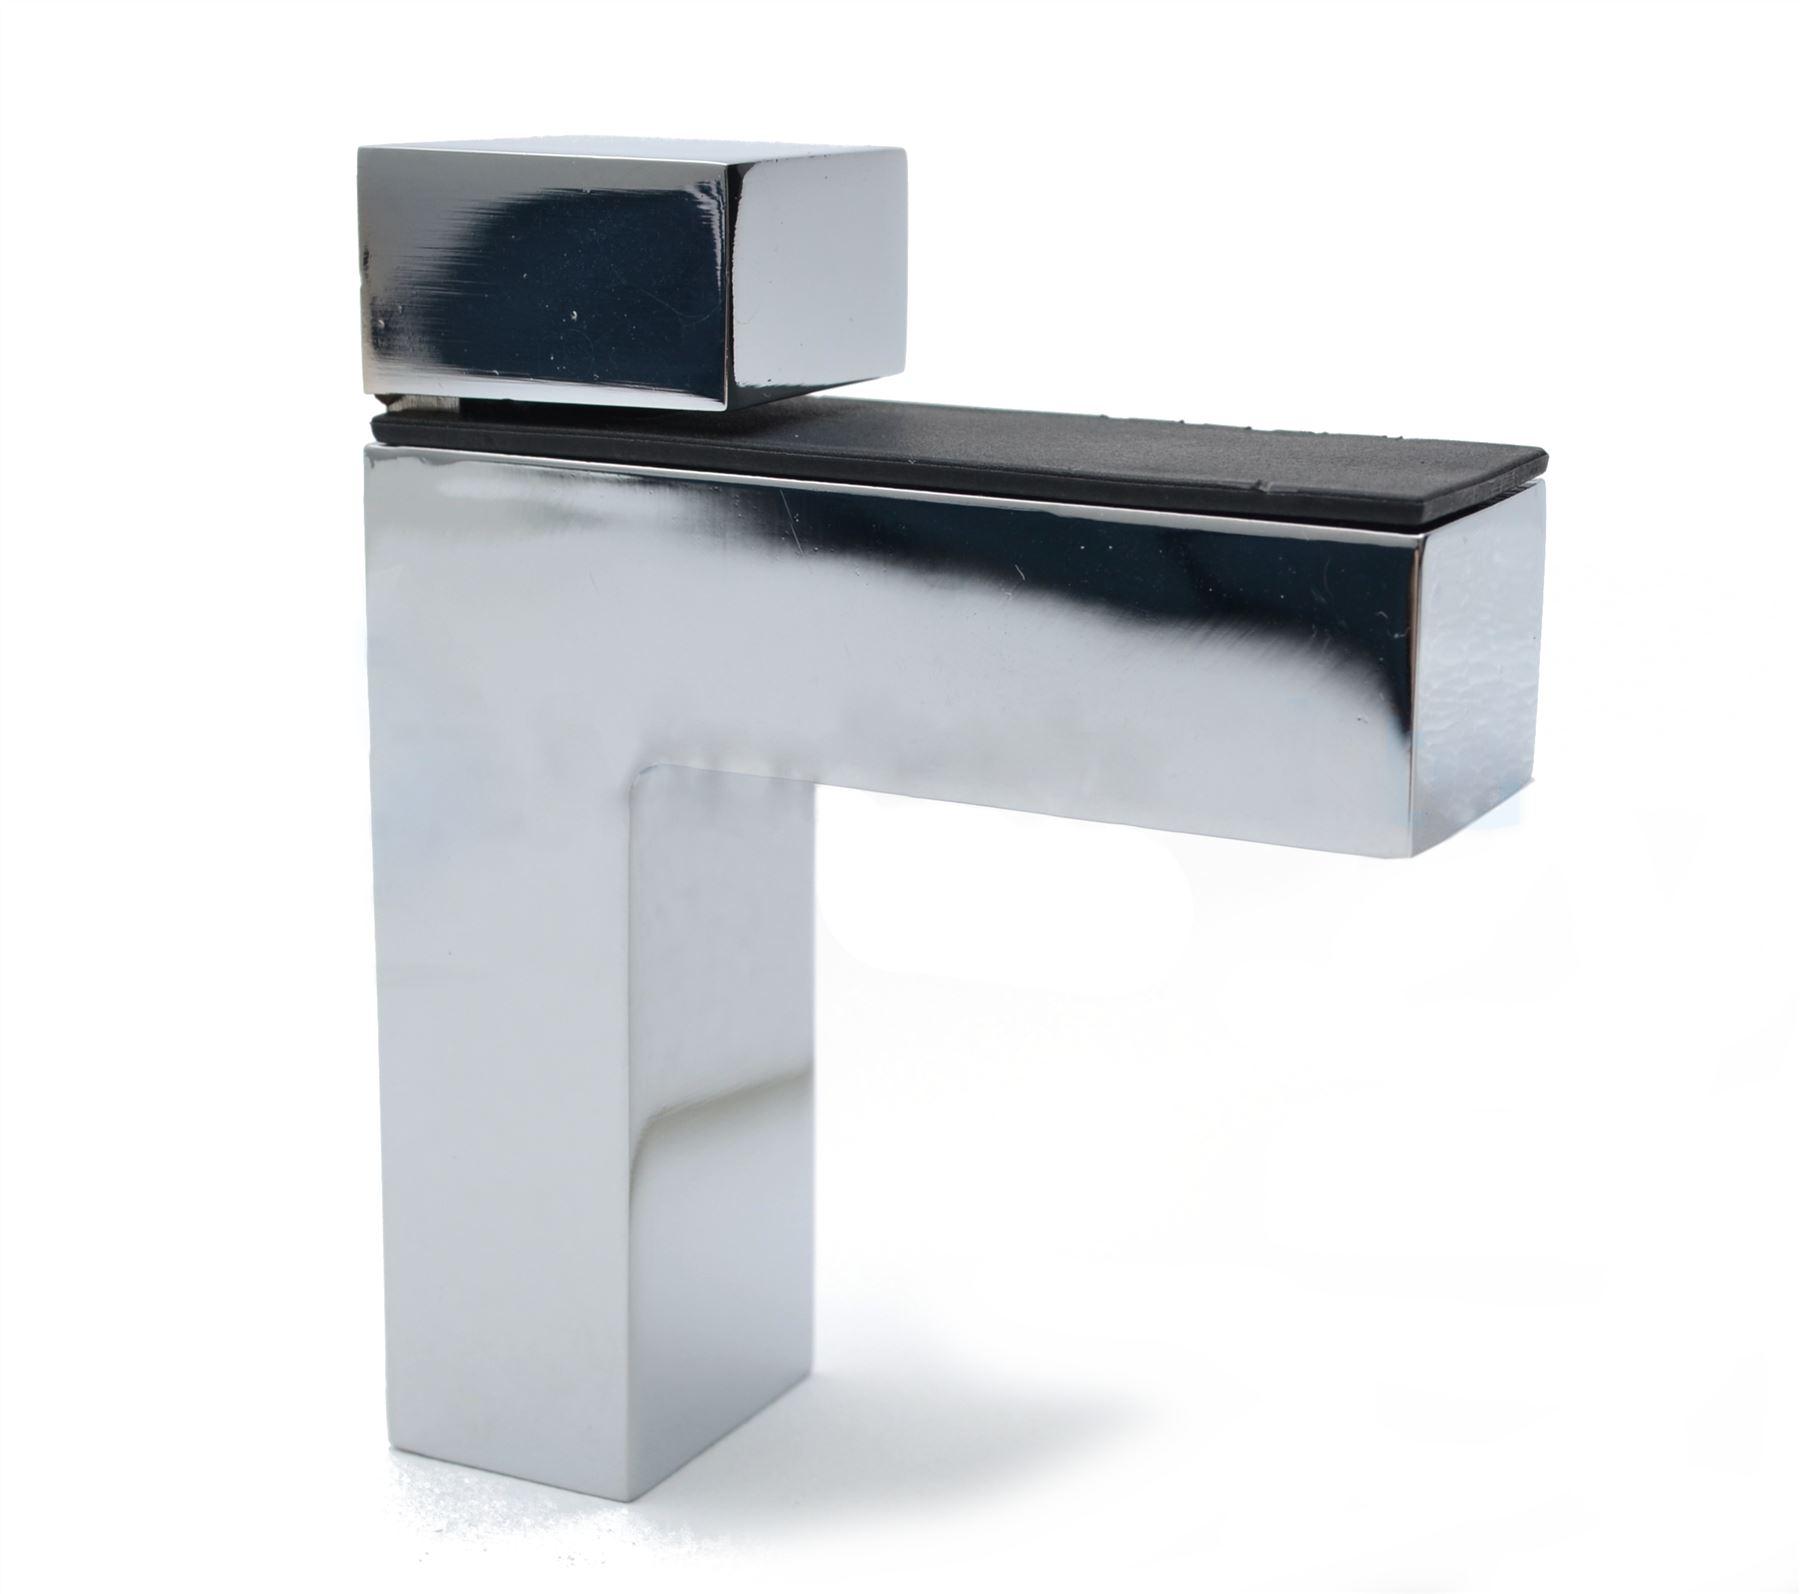 chrome nickel shelf bracket glass shelf support 2 45mm thickness shelves packs ebay. Black Bedroom Furniture Sets. Home Design Ideas